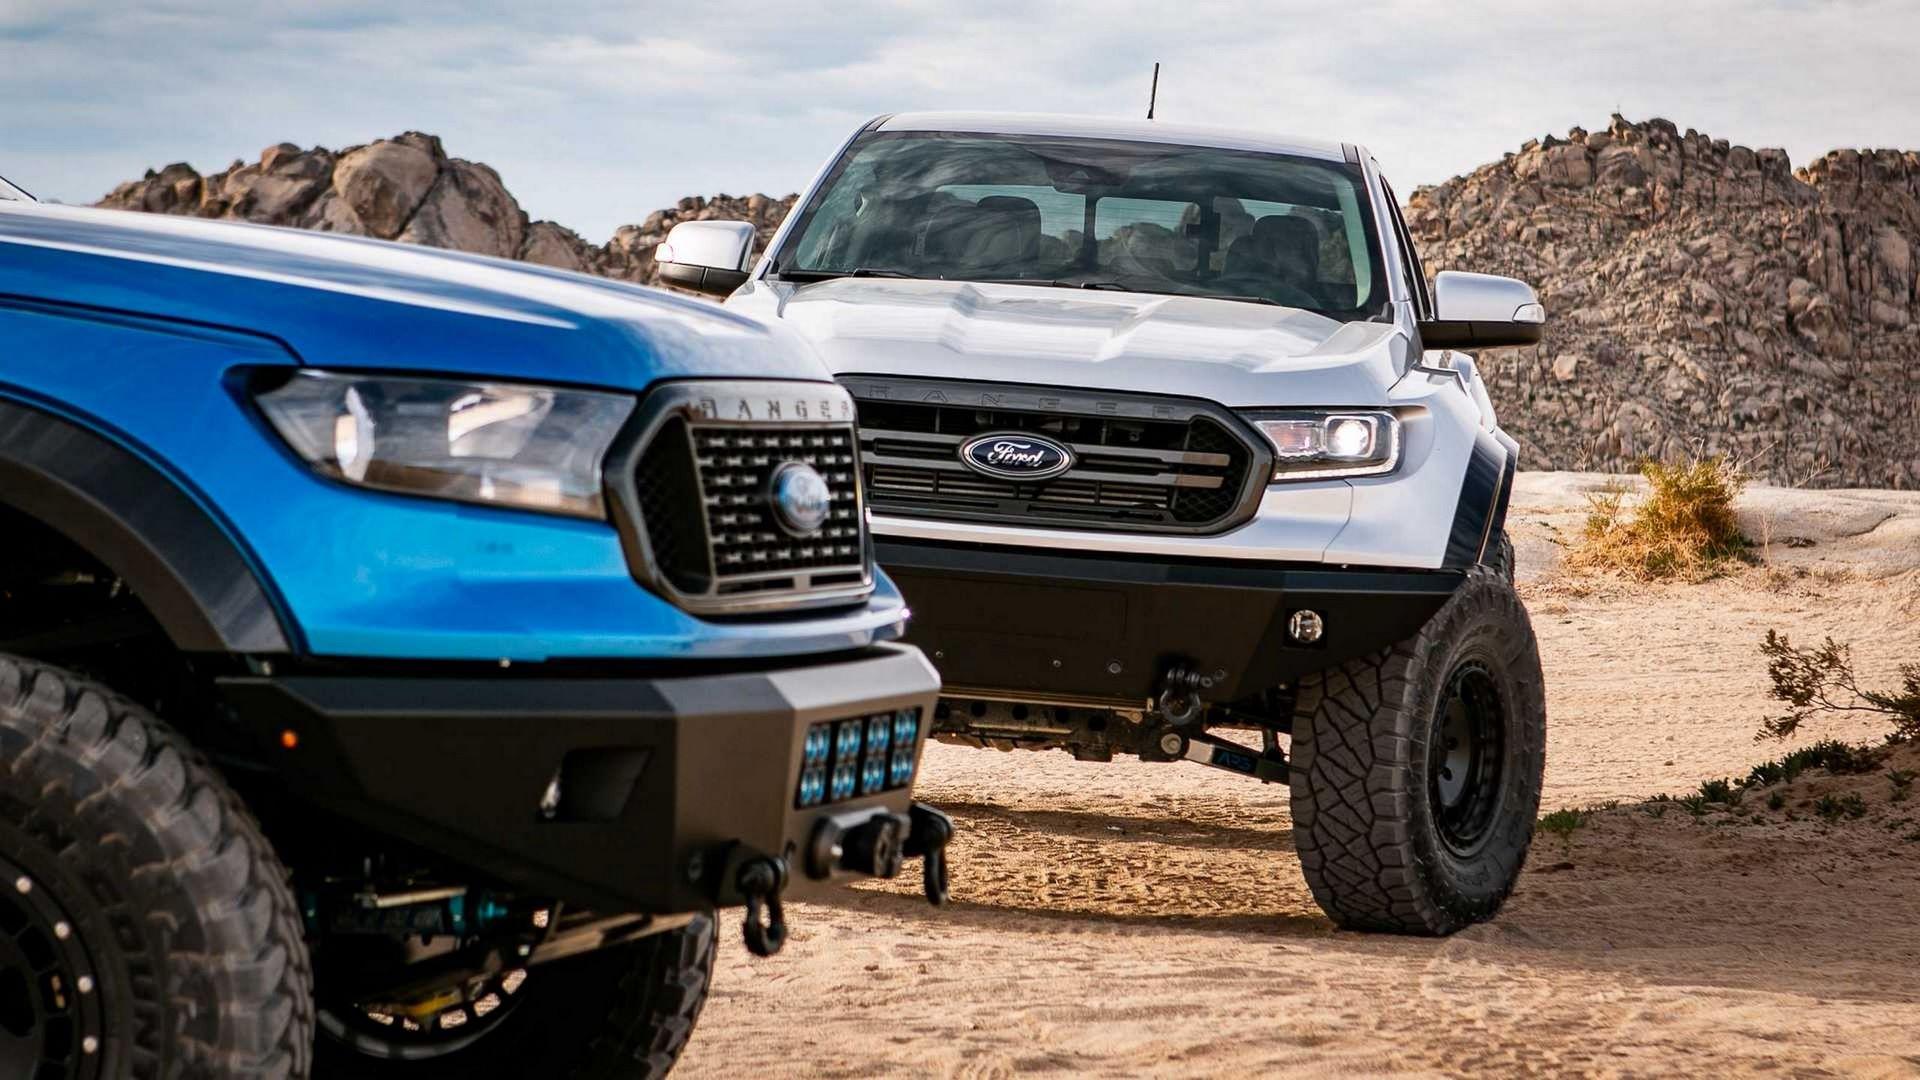 Ford-Ranger-Prorunner-By-APG-22